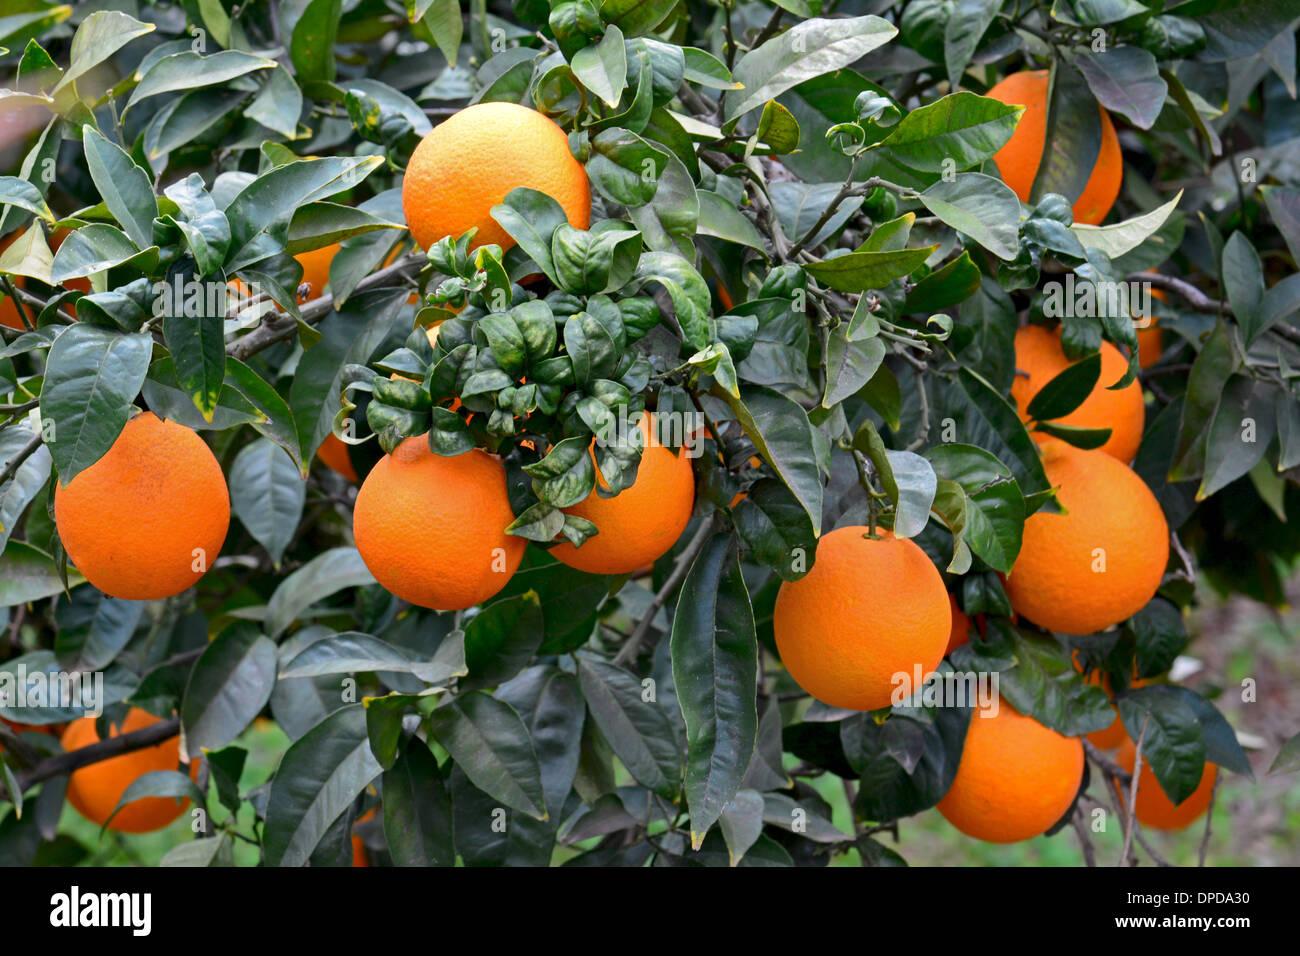 Oranges on Orange Tree - Stock Image